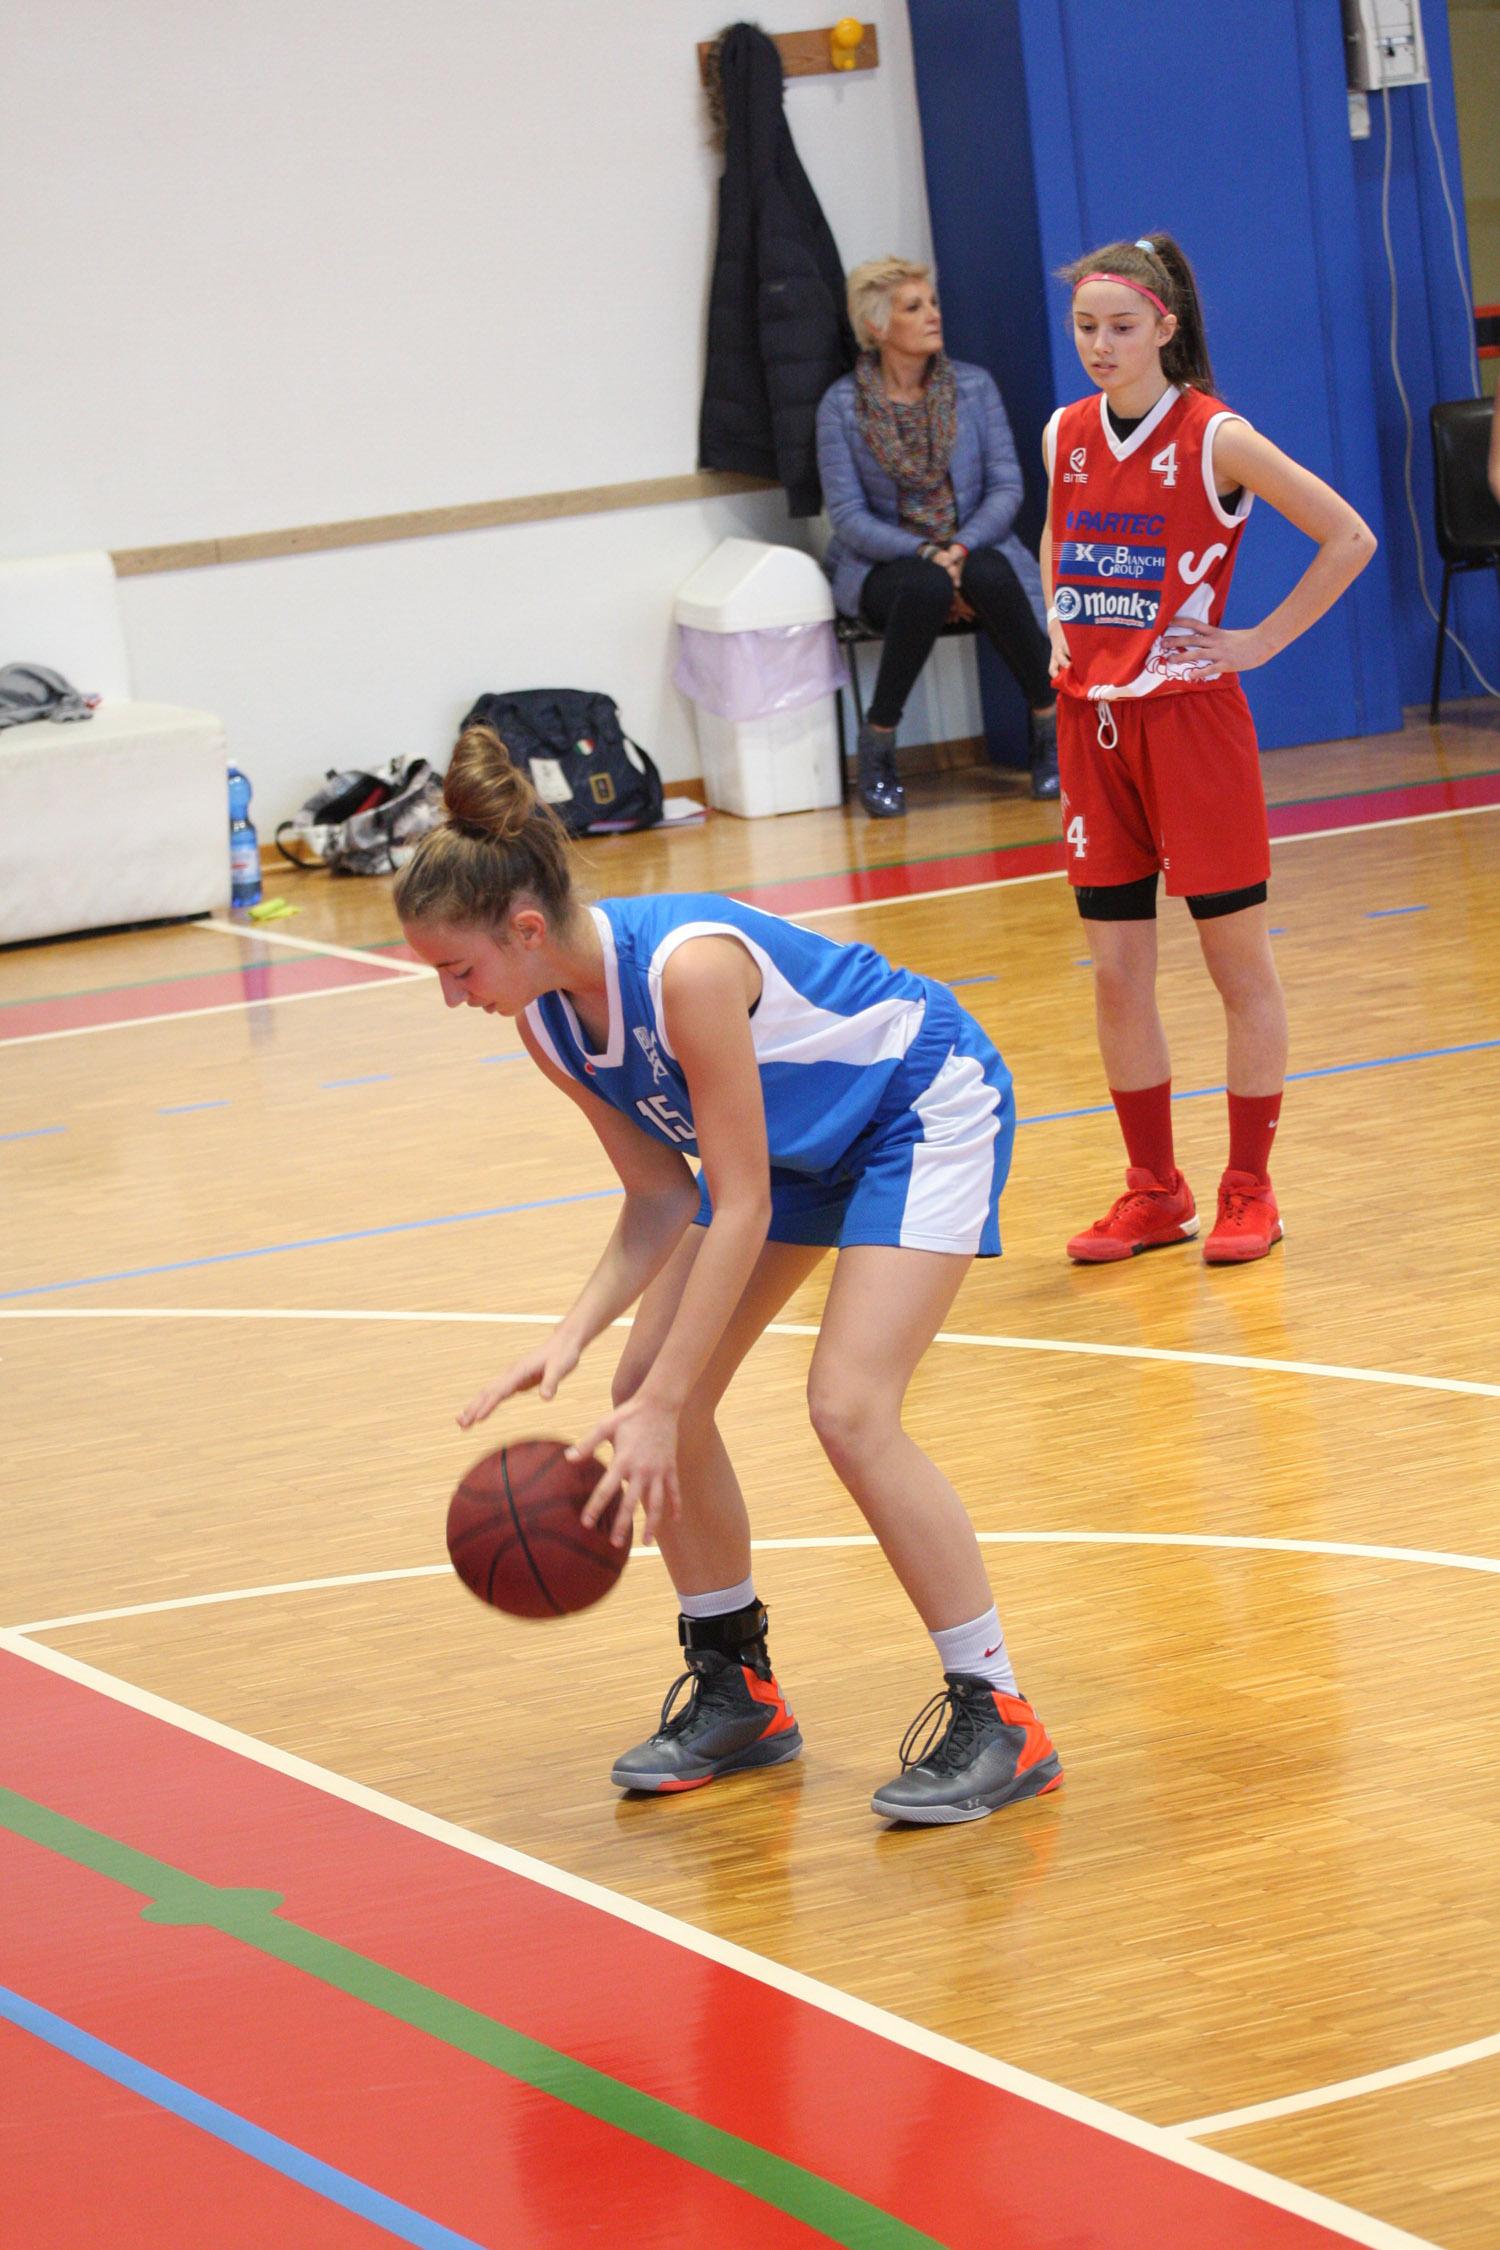 U16E - Costa Masnaga vs Baskettiamo Vittuone 2001 00018.jpg